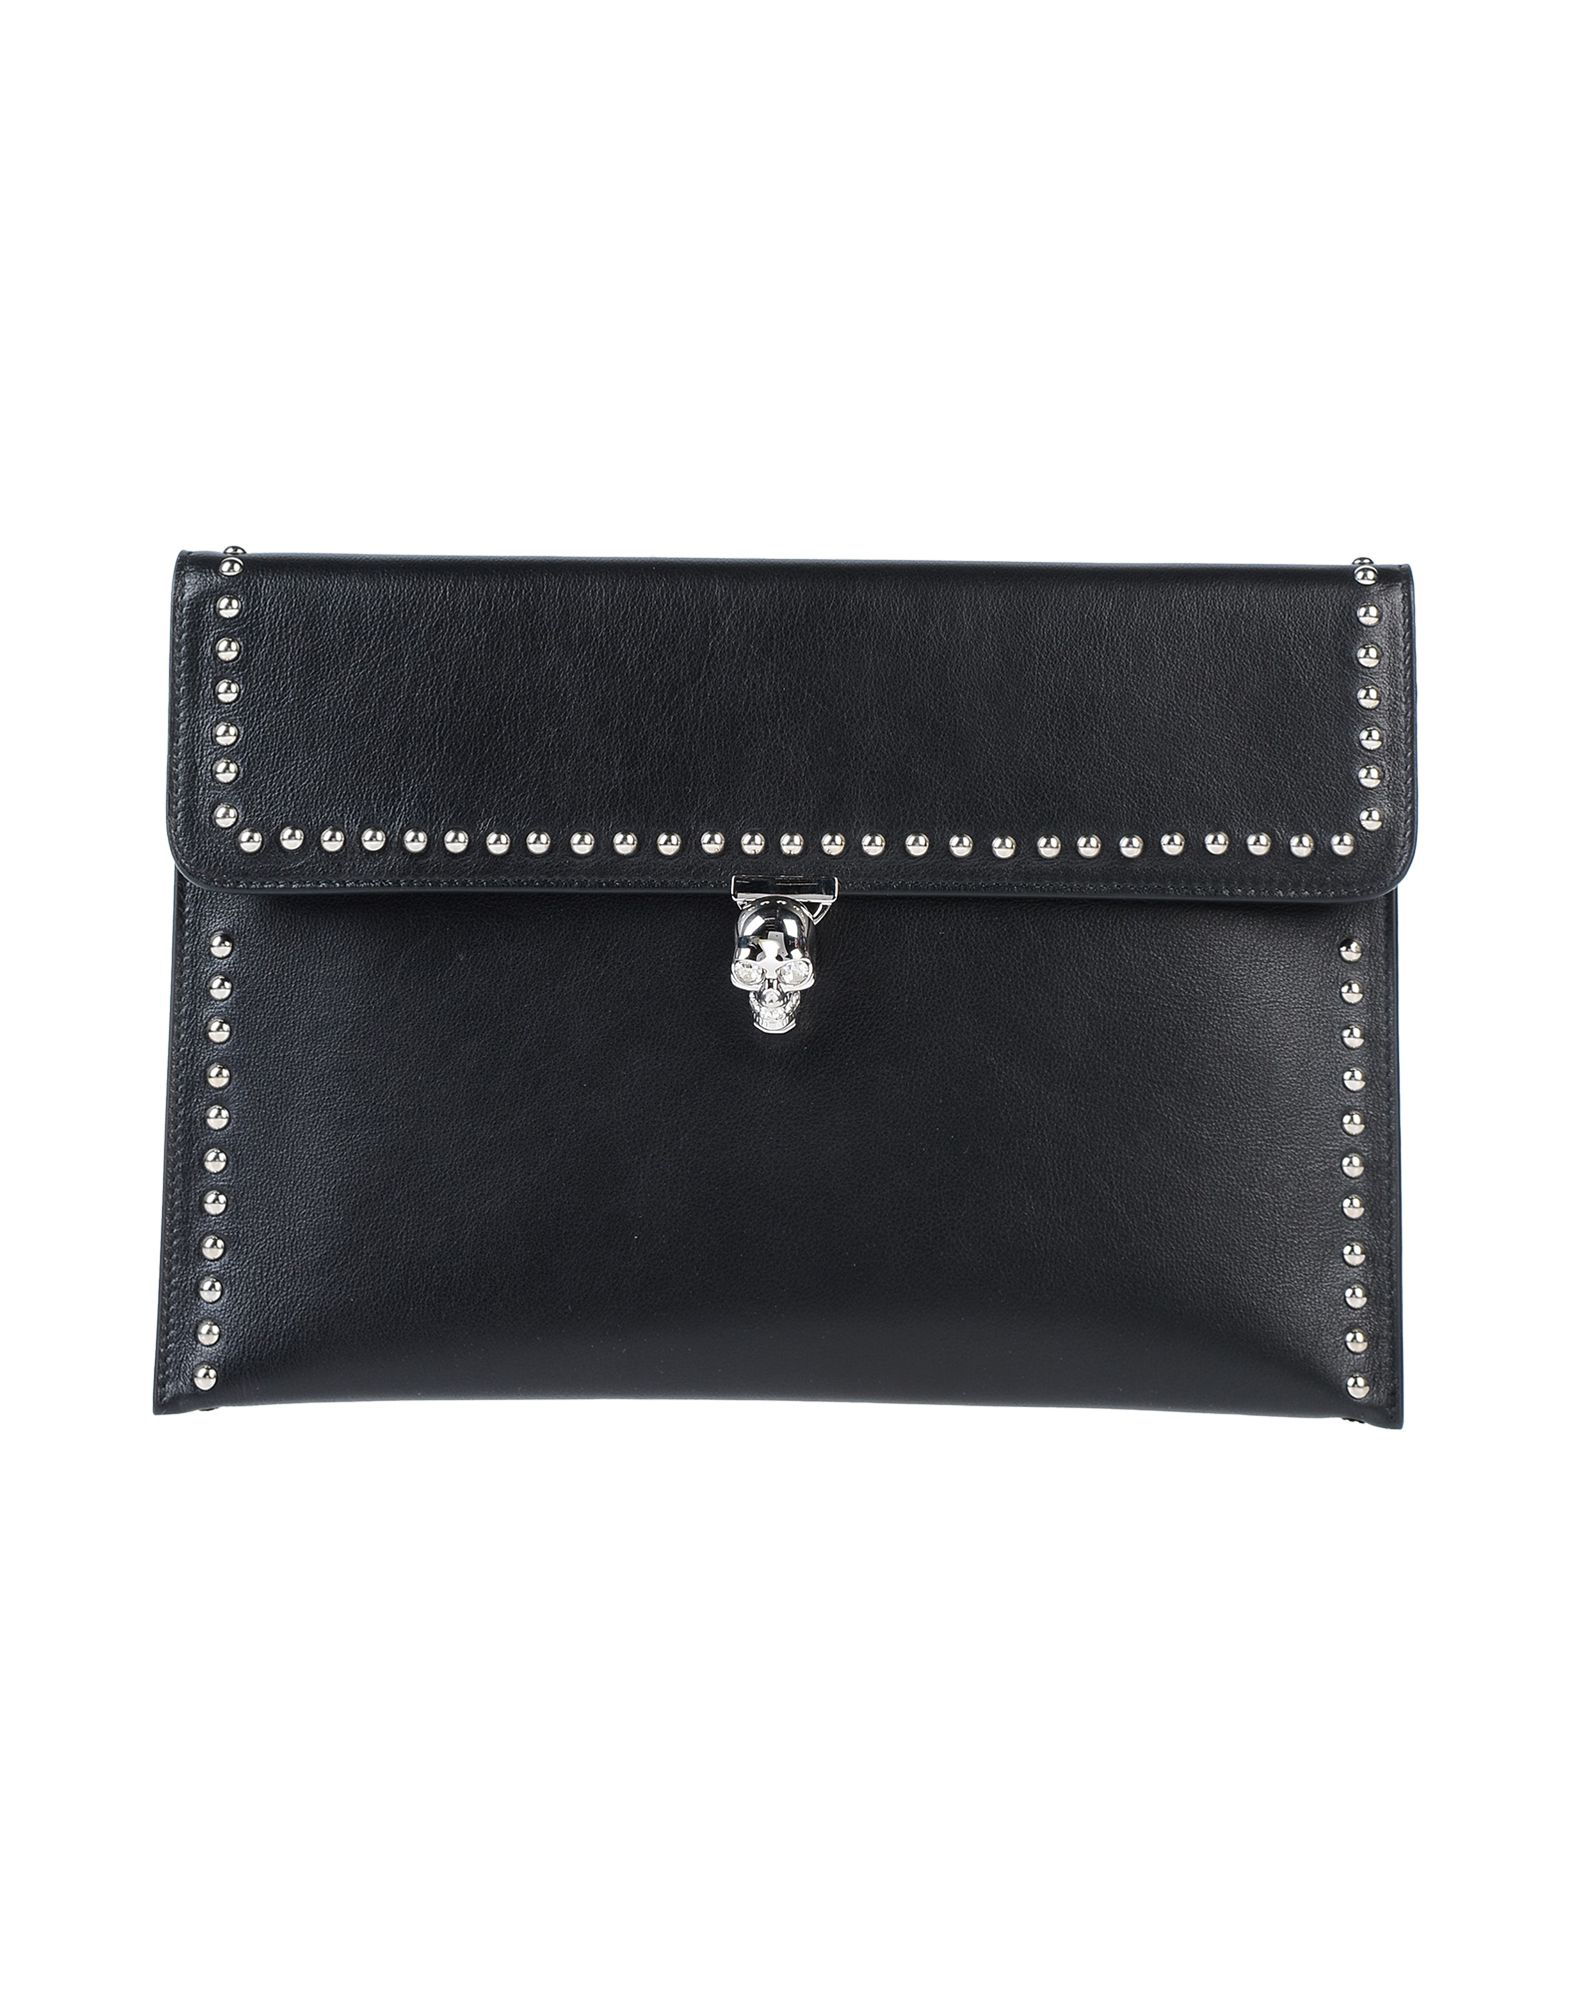 Alexander Mcqueen Handbag In Black | ModeSens